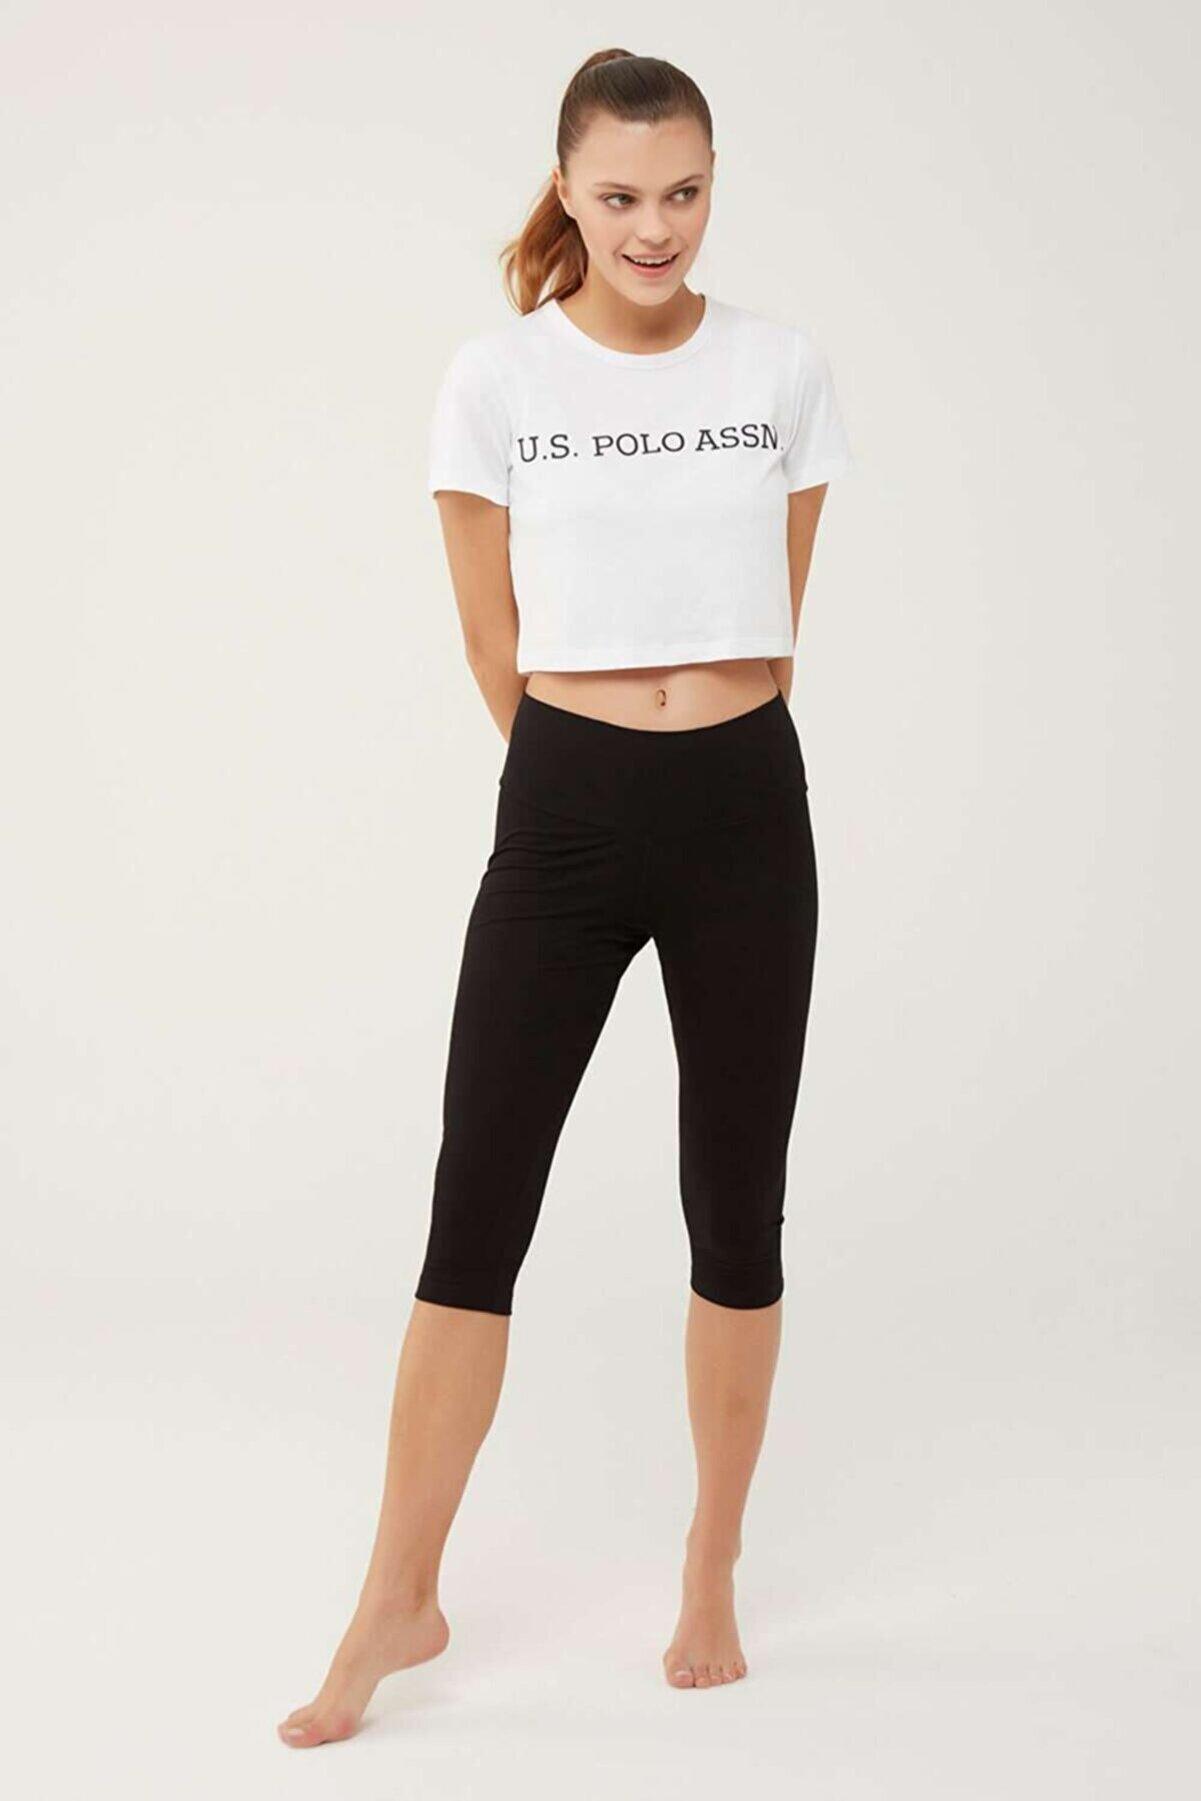 US Polo Assn Kadın Siyah Kısa Tayt